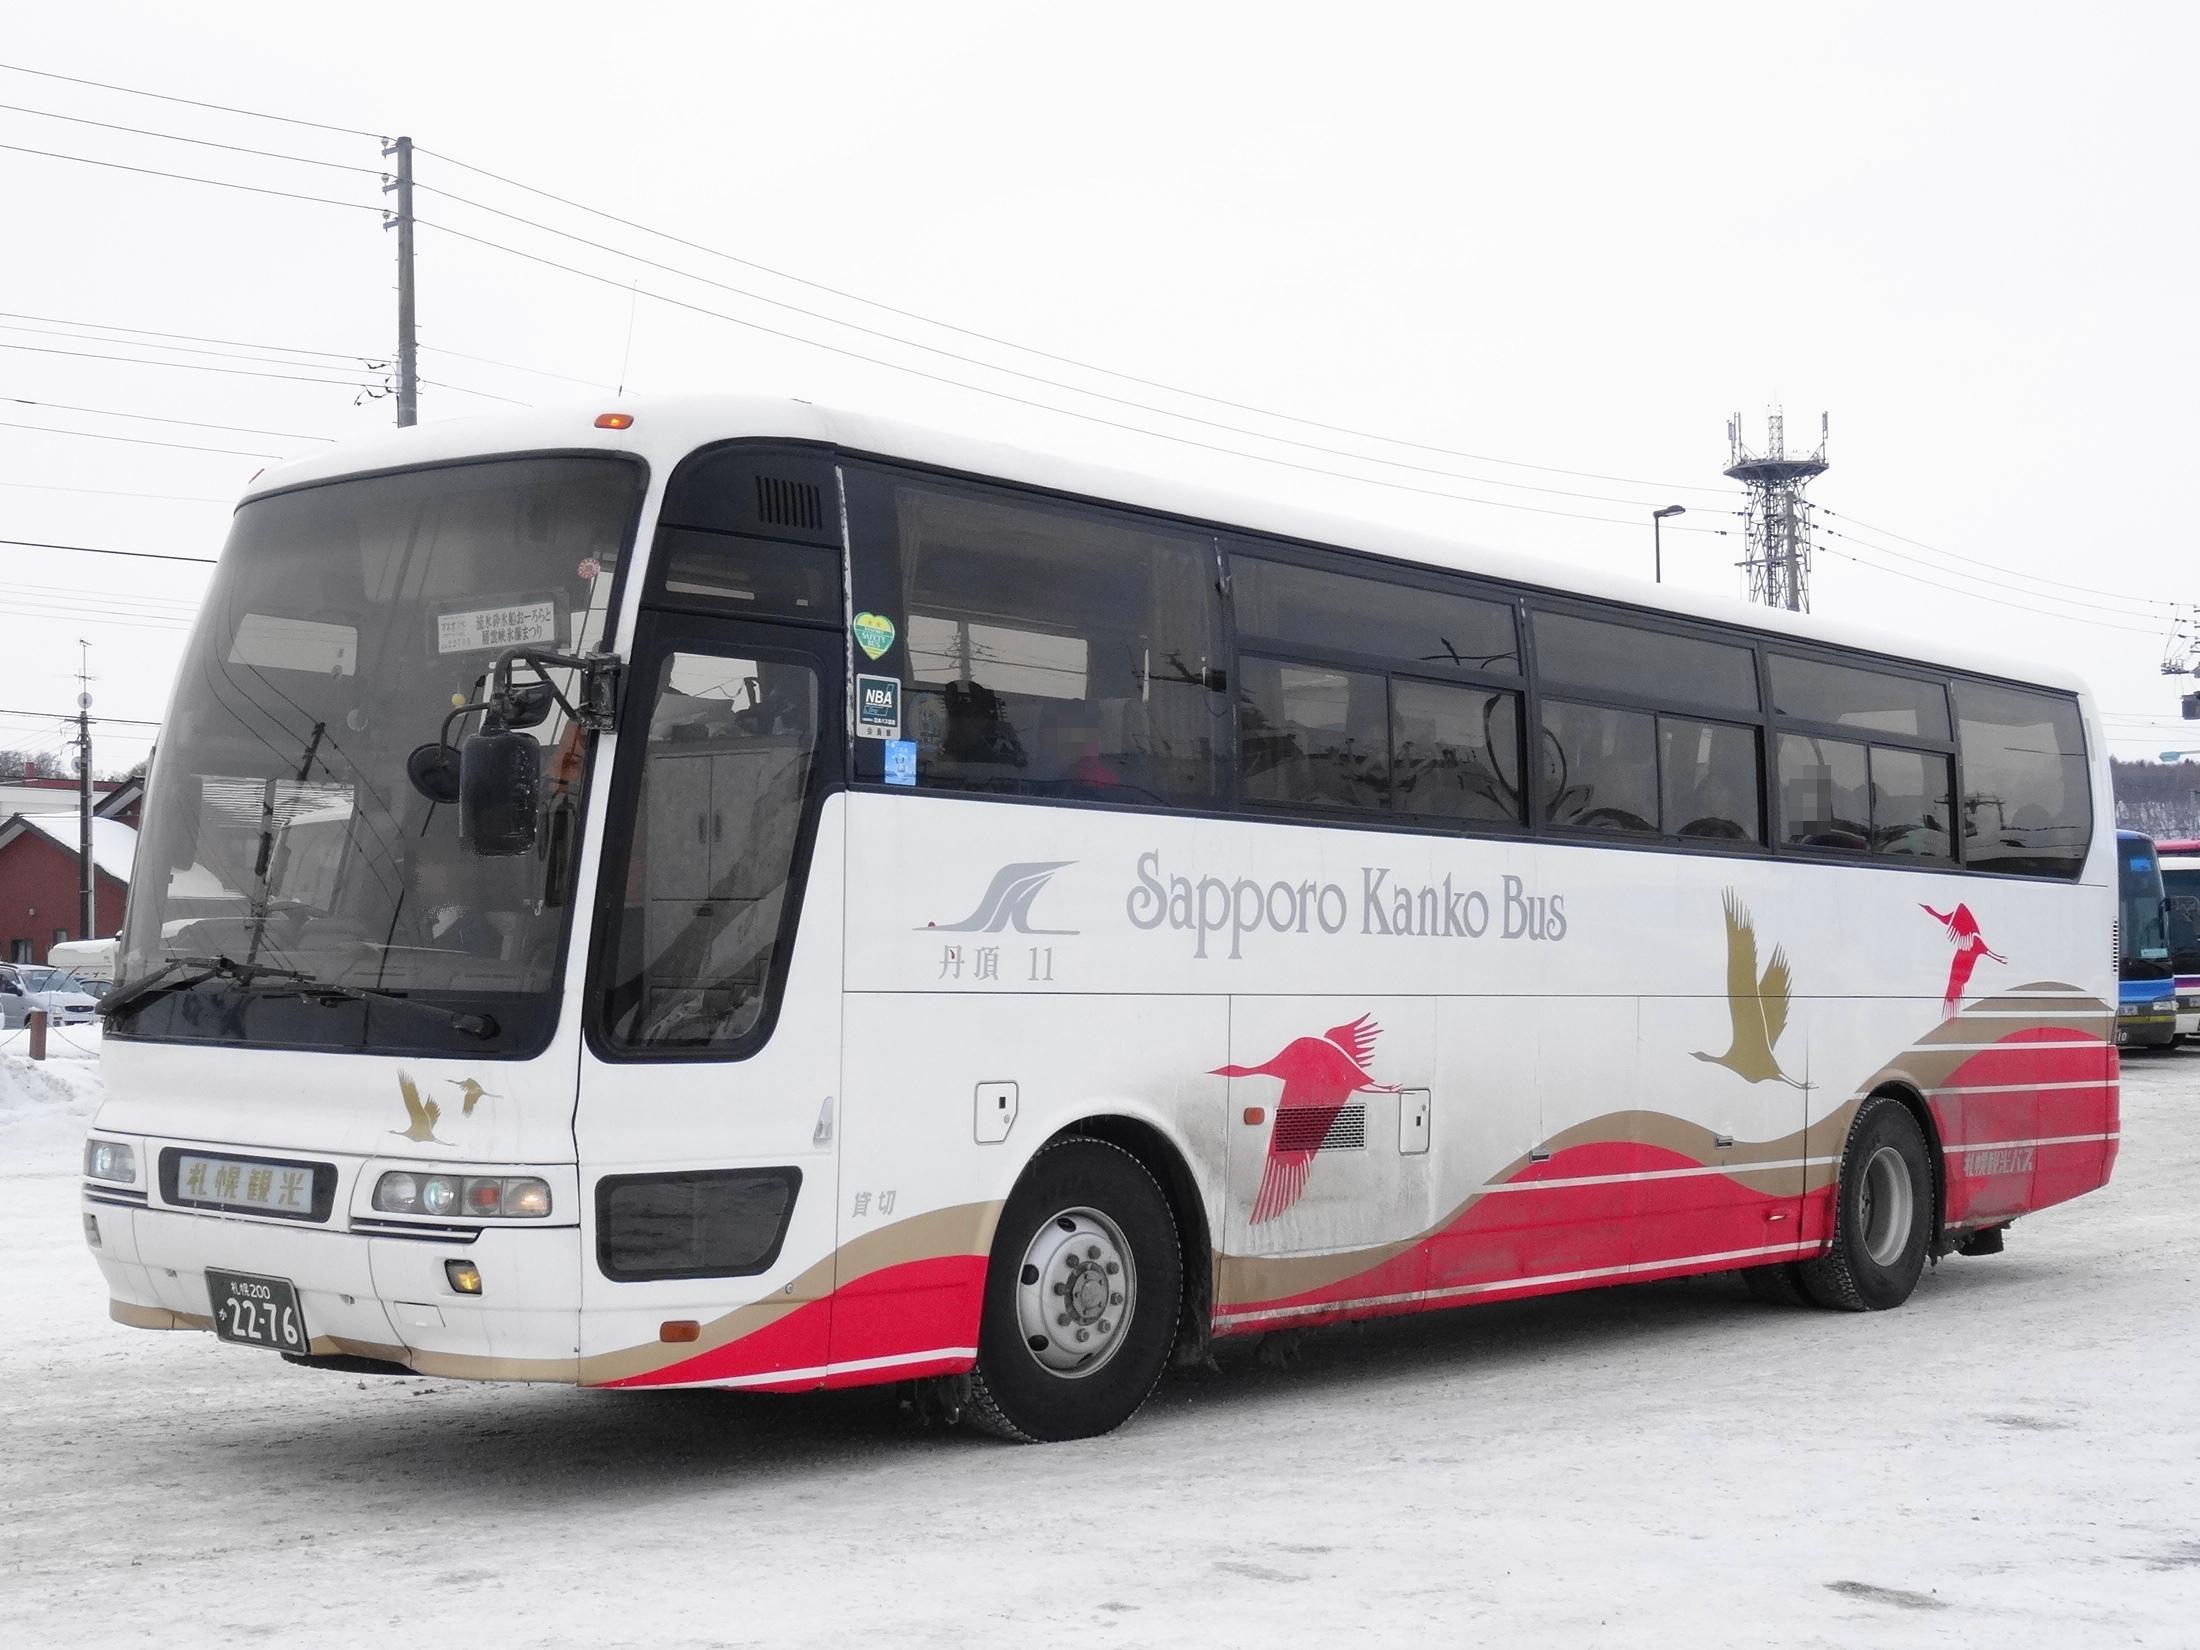 File:Sapporo kankō S200F 2276.JPG